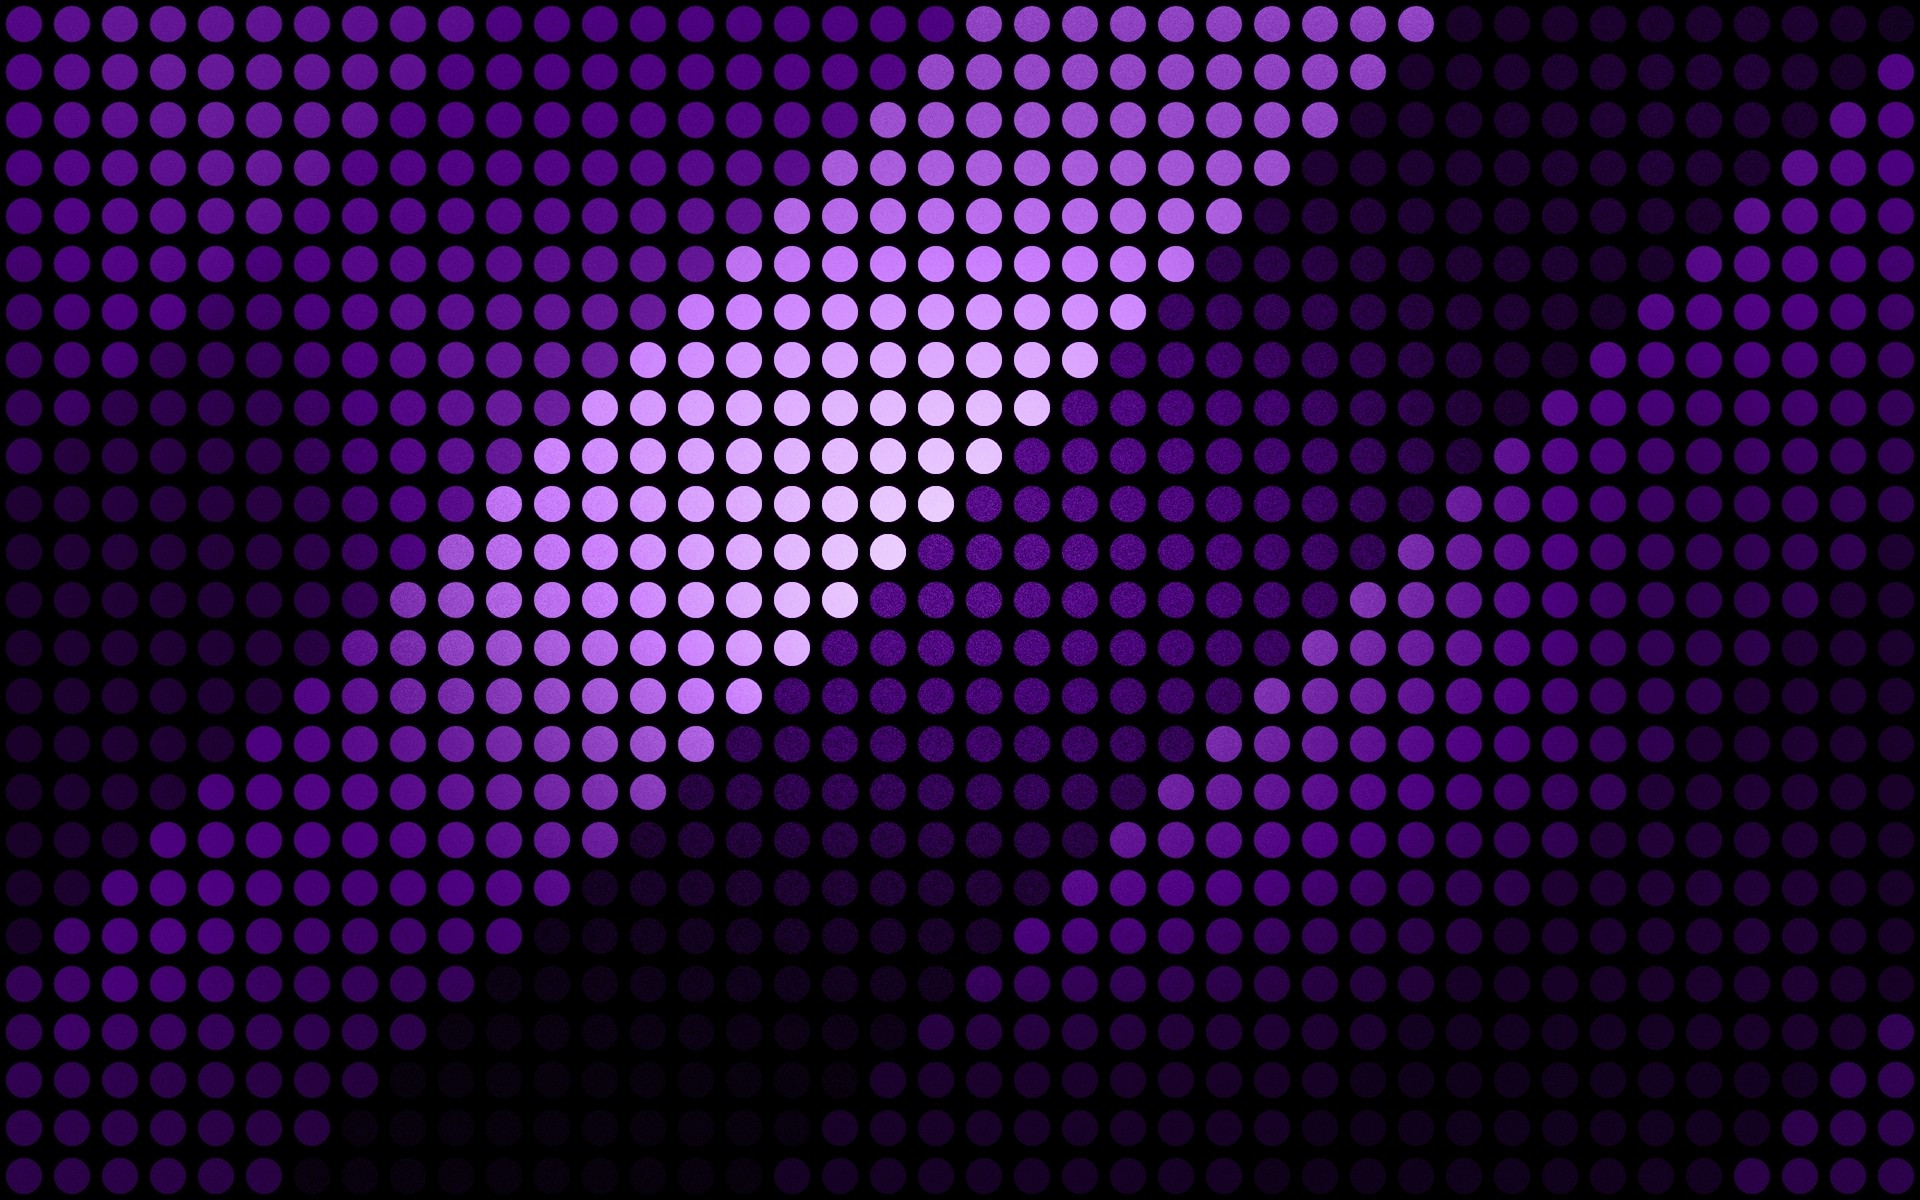 Artistic Purple Dots Wallpaper